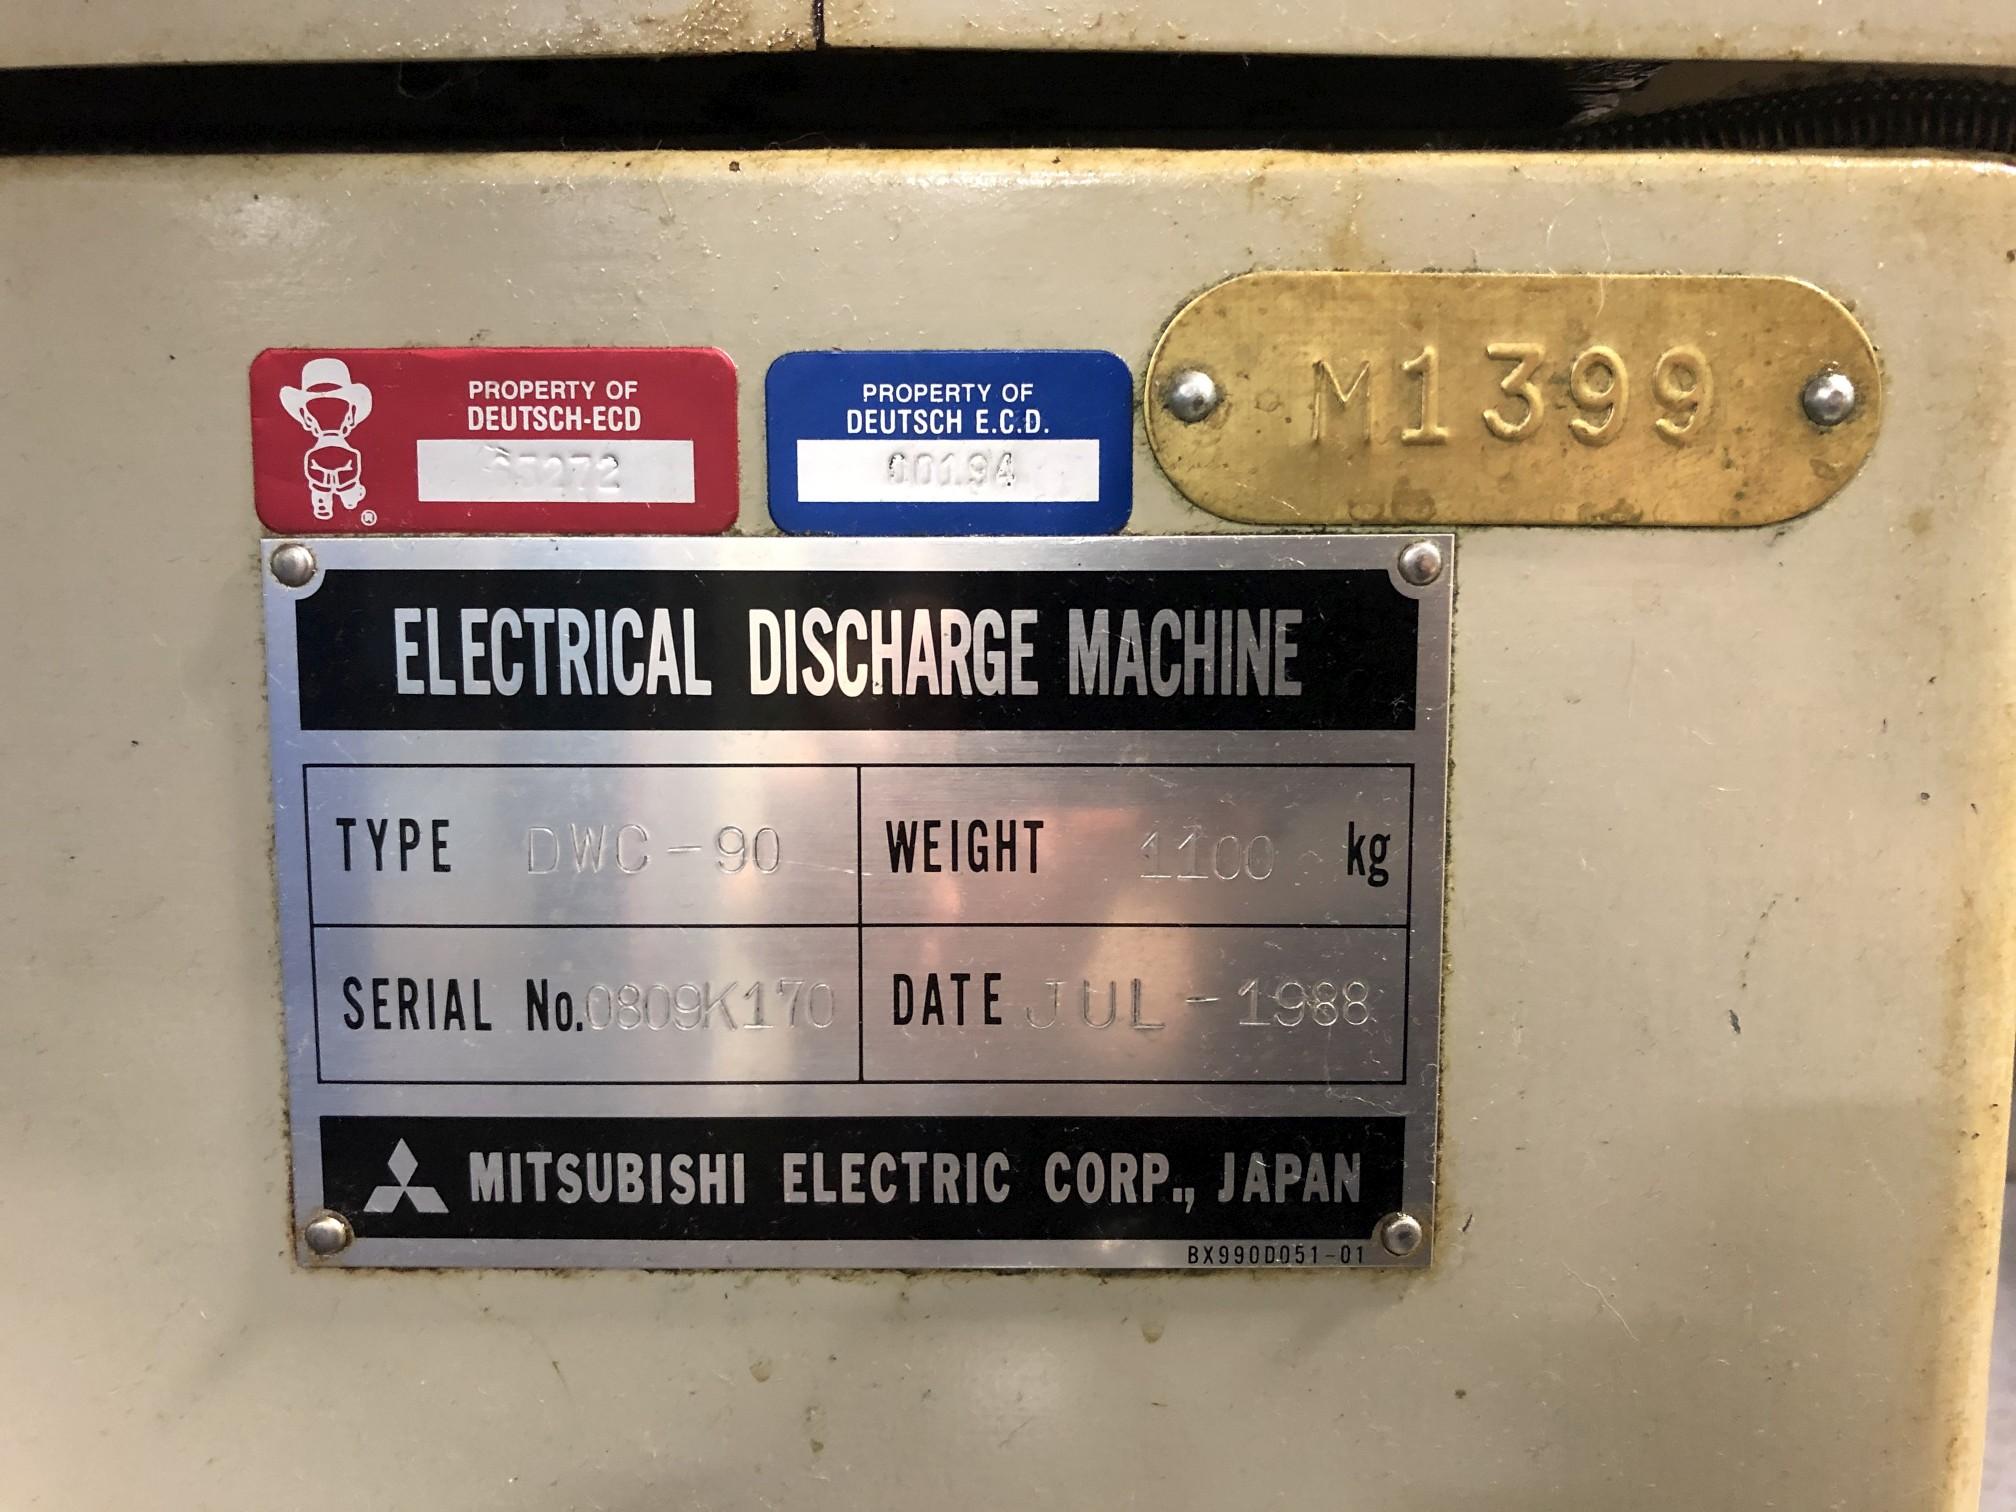 1988 Mitsubishi DWC90H CNC Wire EDM - Image 13 of 13